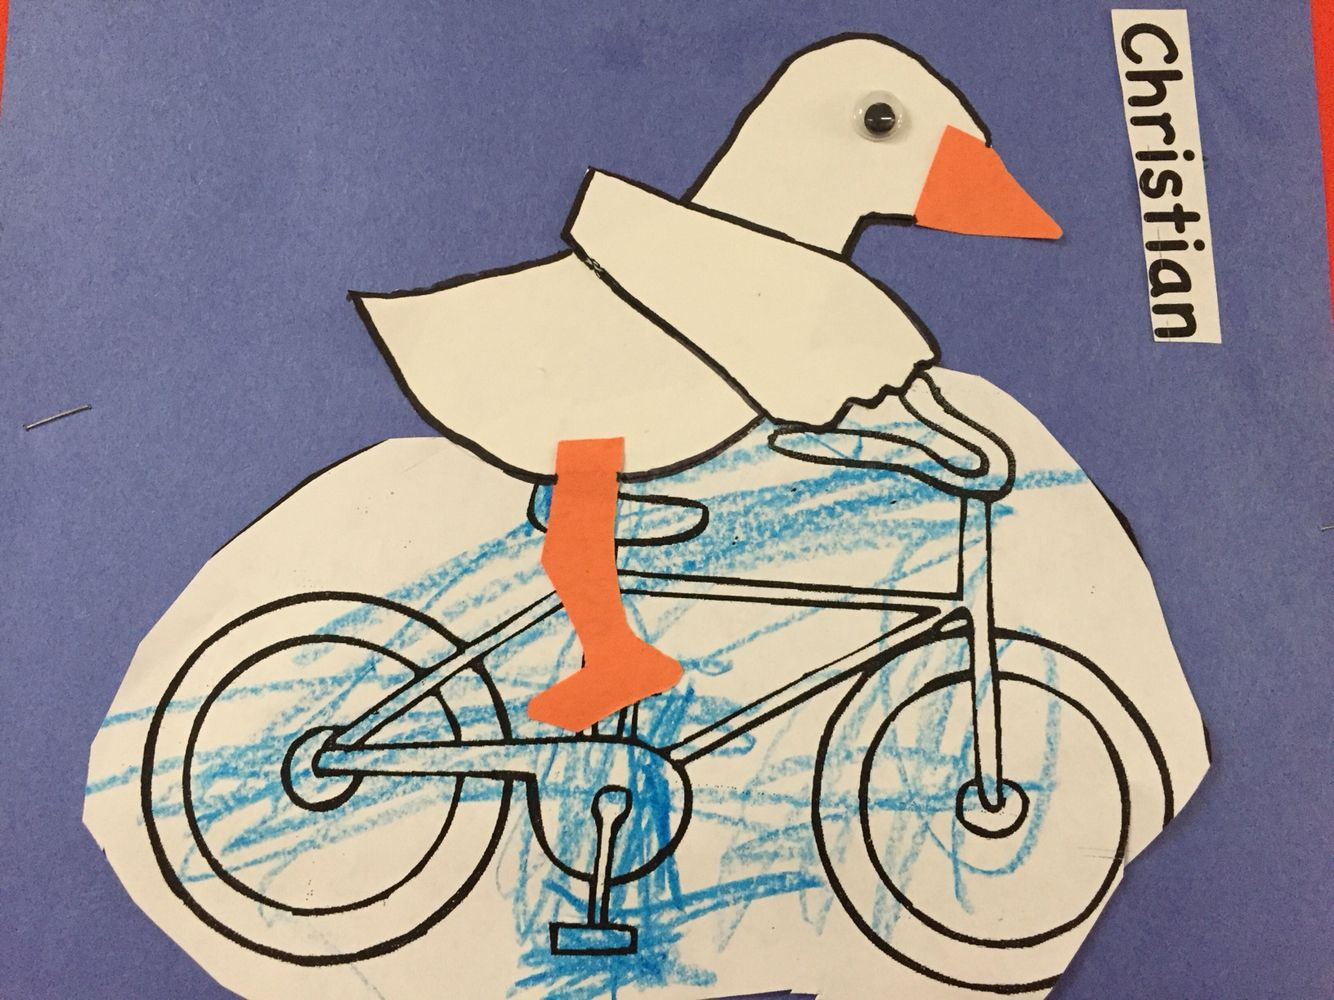 Farm Theme Duck On A Bike Book Art Project Duck On A Bike Book Art Projects Farm Theme